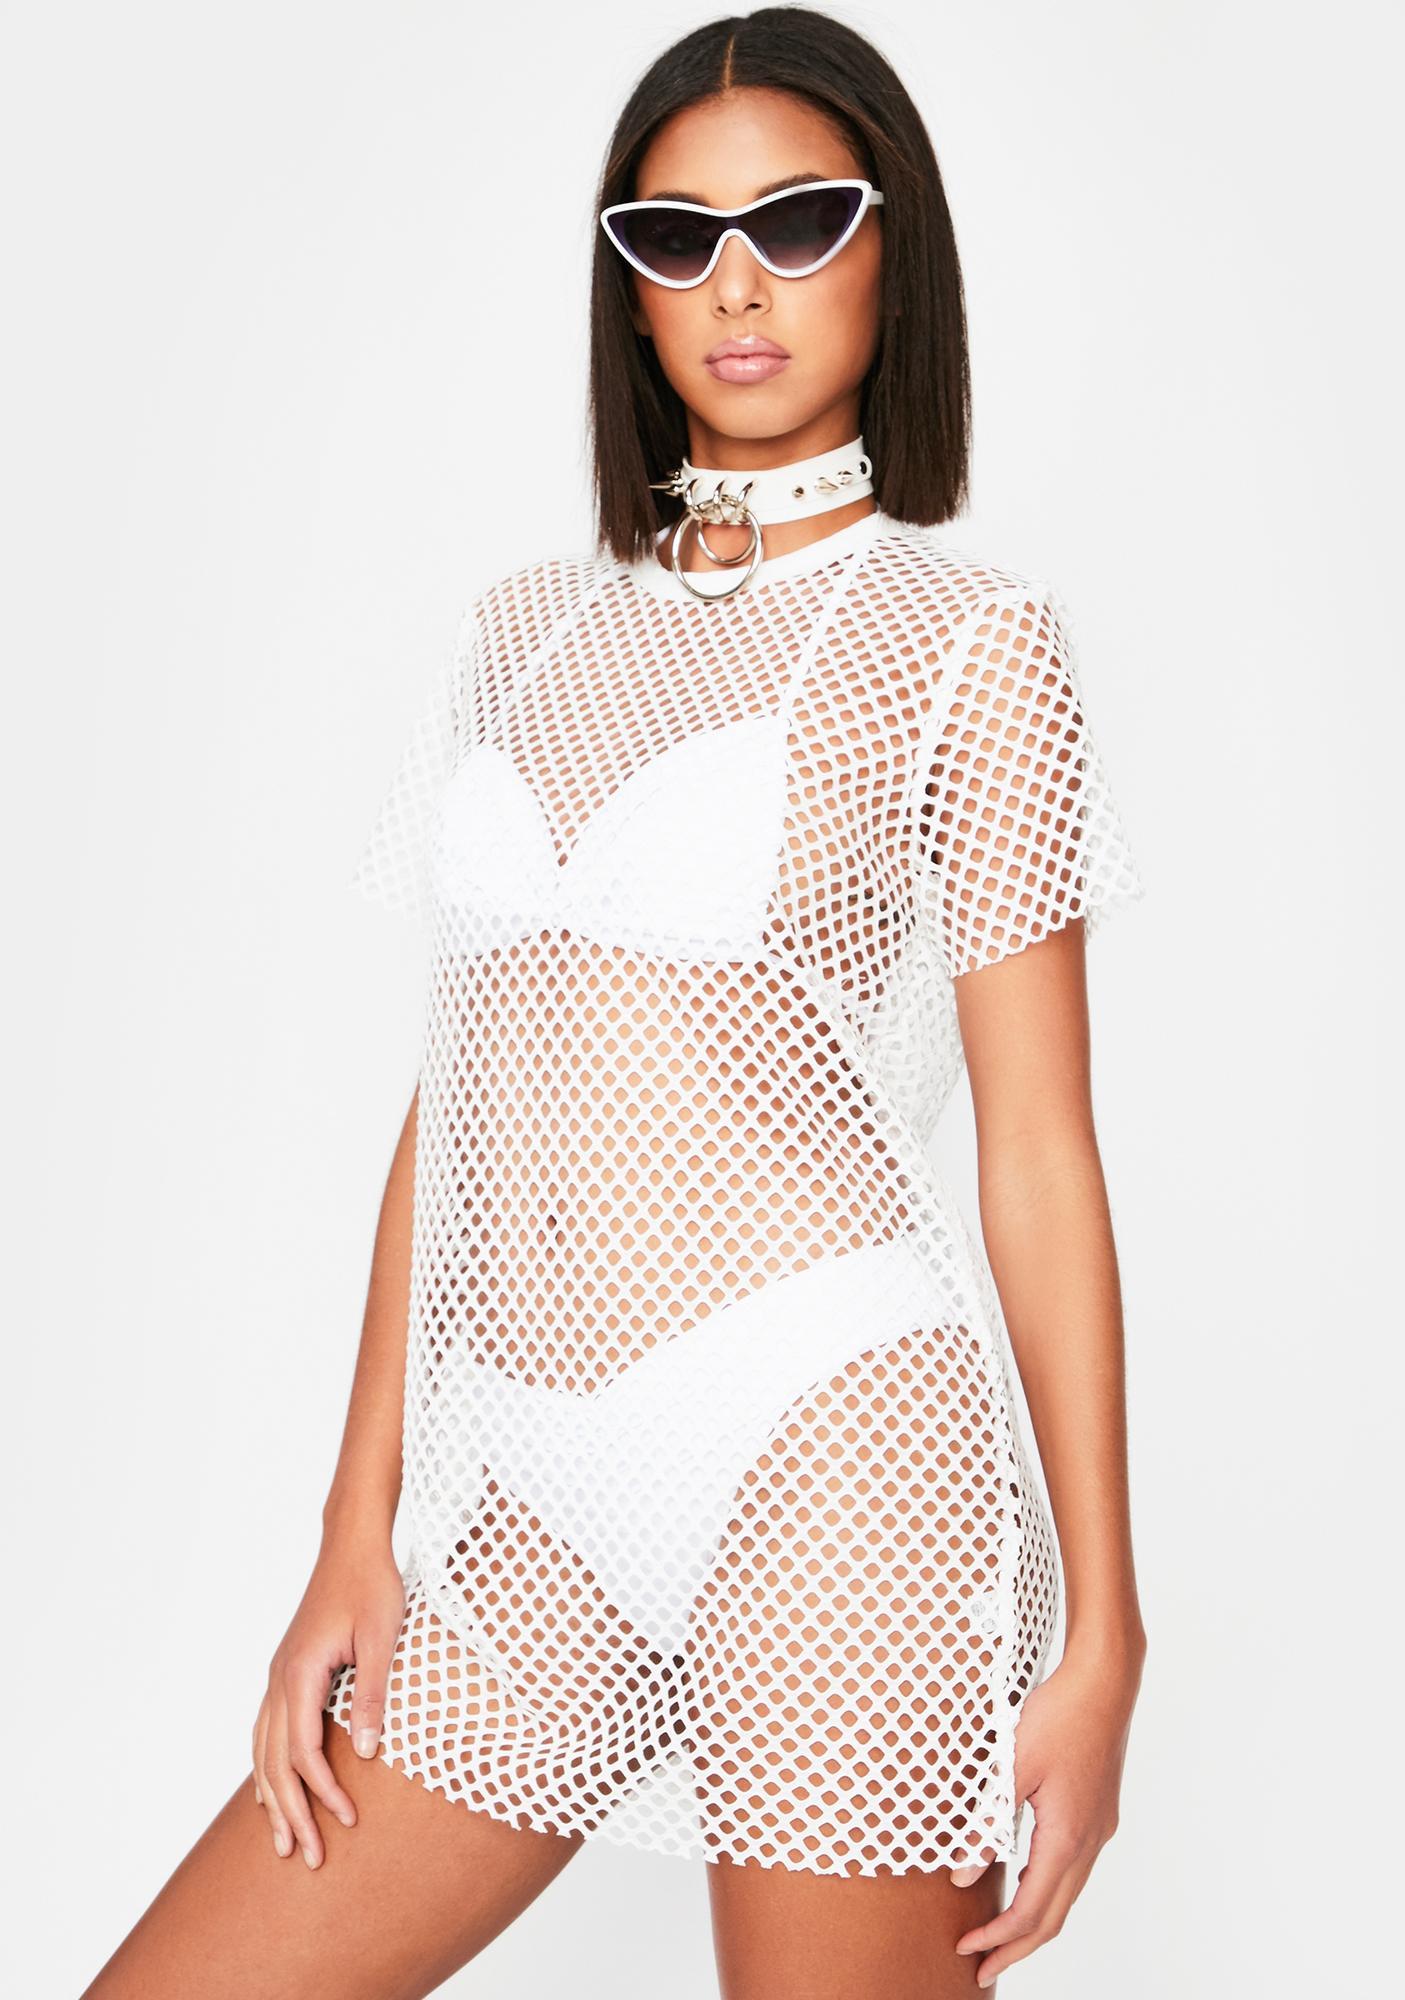 Here To Impress Fishnet Dress